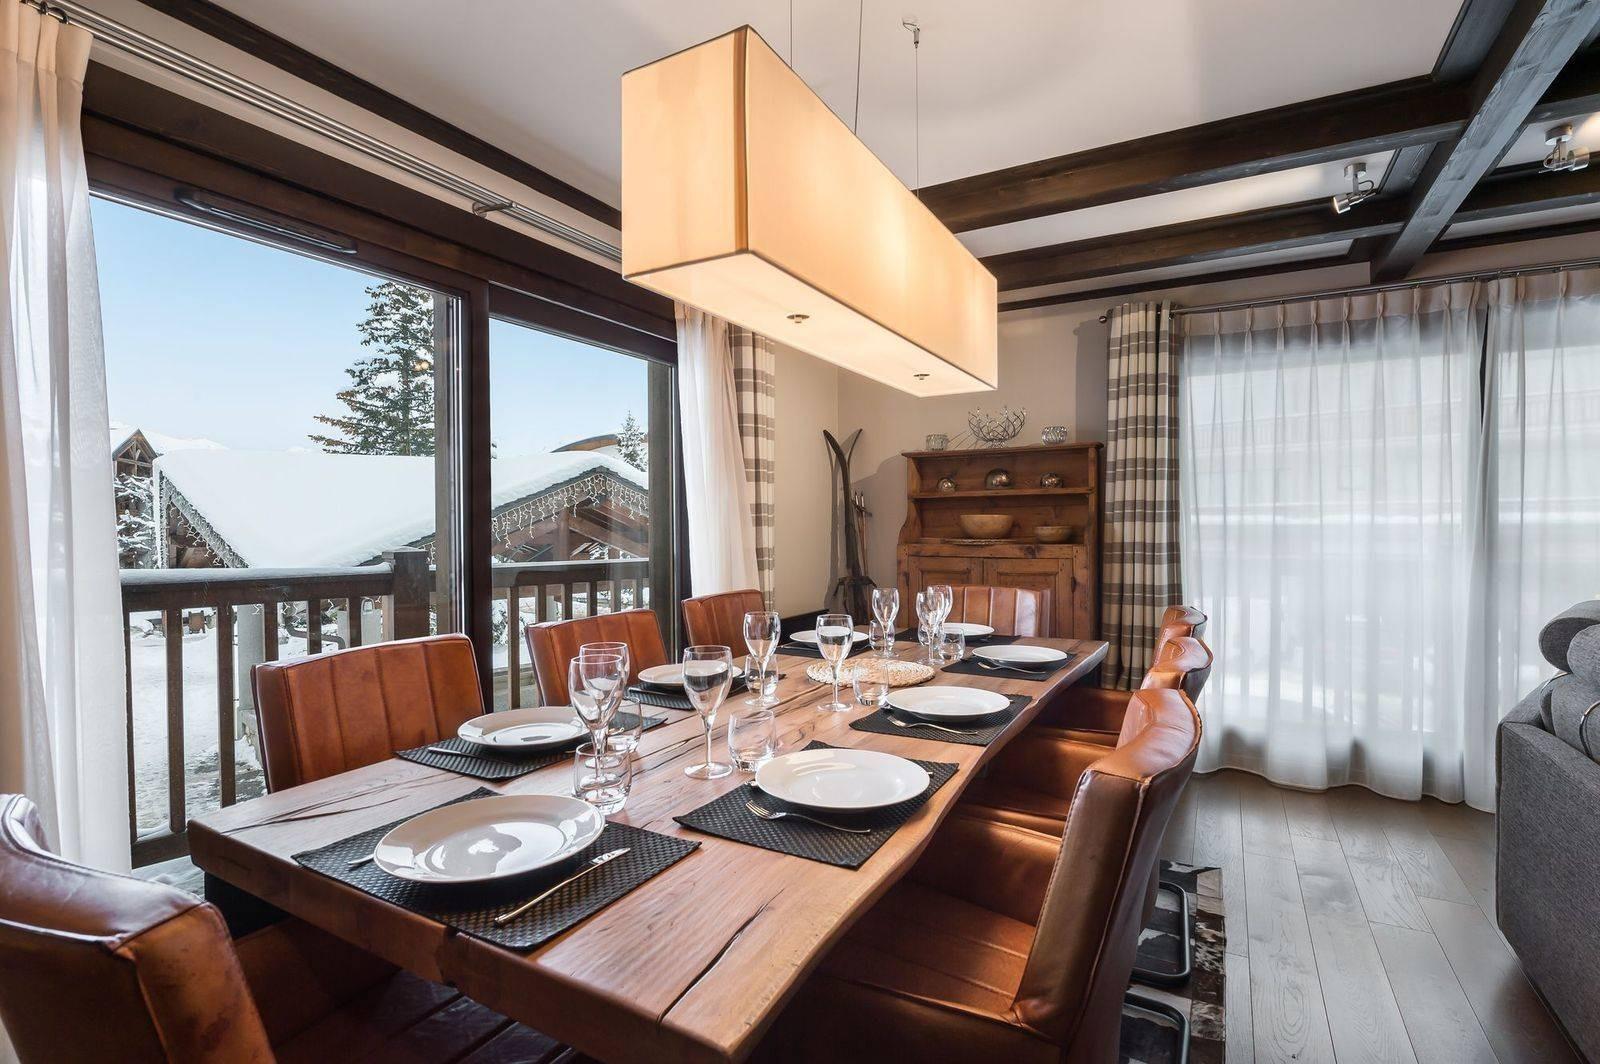 Courchevel 1650 Luxury Rental Appartment Neroflier Dining Room